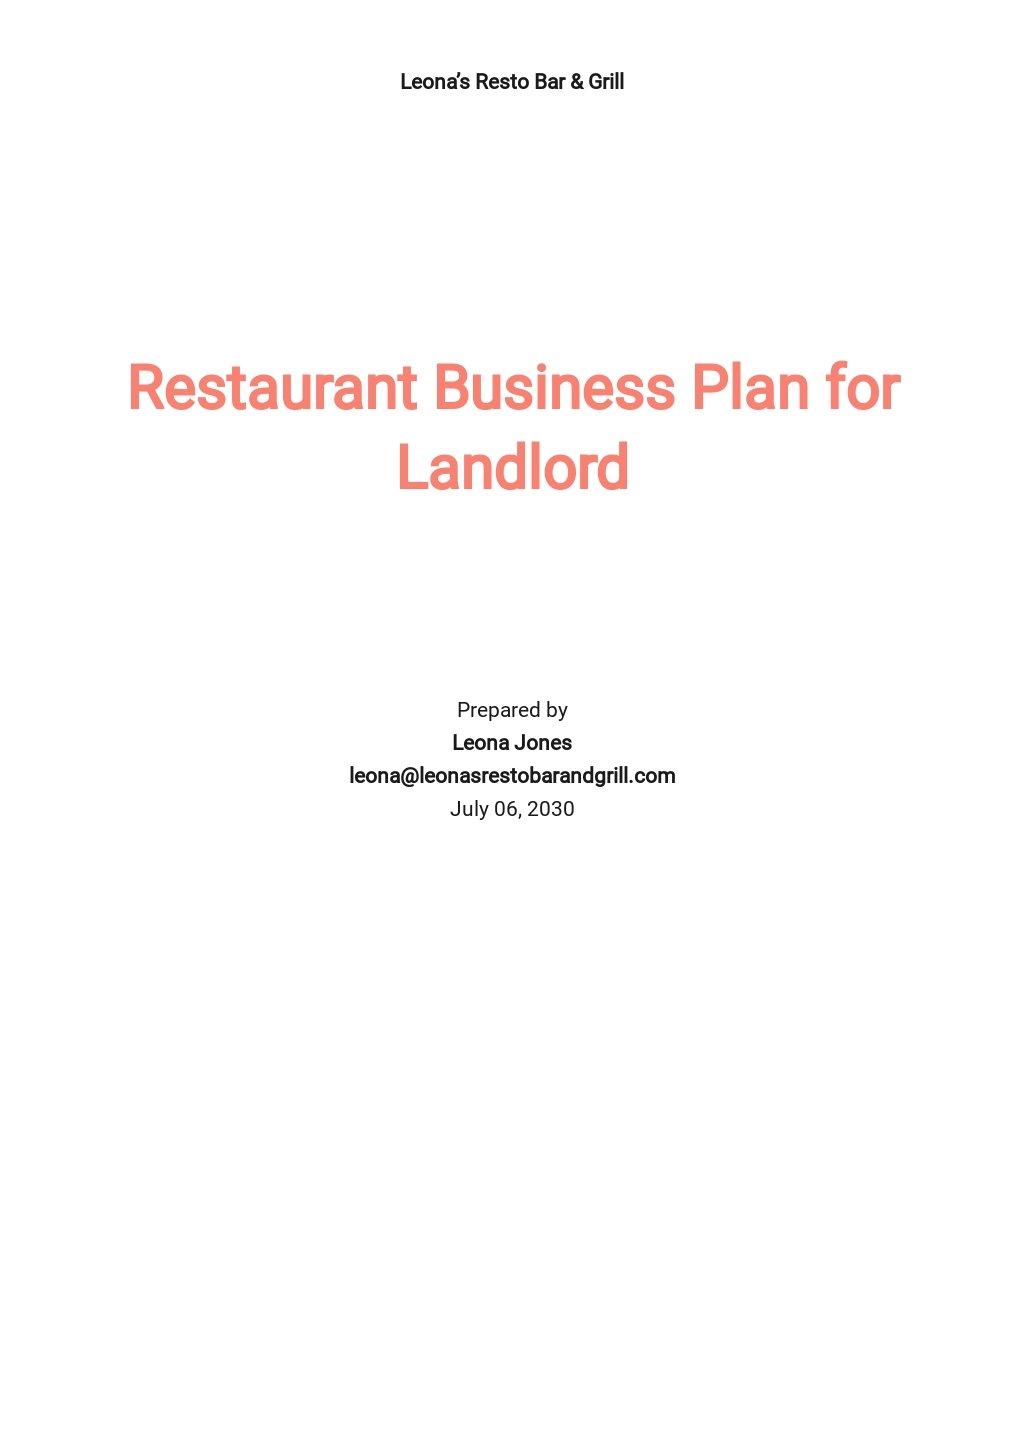 Restaurant Business Plan for Landlord Template.jpe